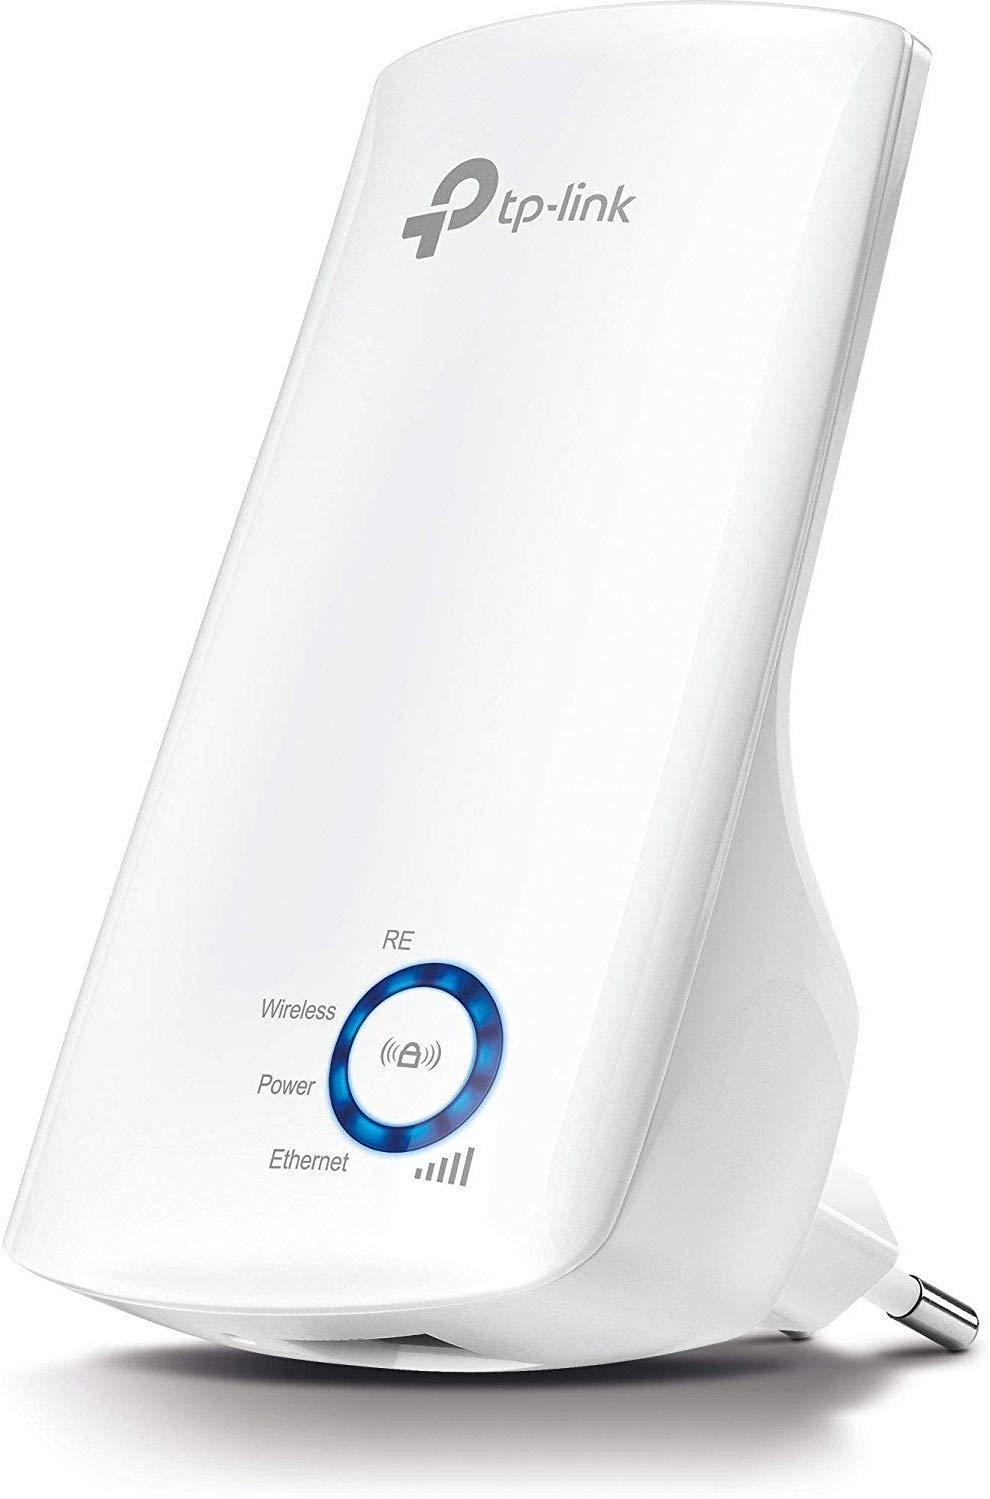 TP-Link TL-WA850RE - Repetidor de red Wifi extensor amplificador de cobertura(Puerto Ethernet,10/100 mbps, con enchufe, 300 Mbps, 2.4 GHz), Blanco